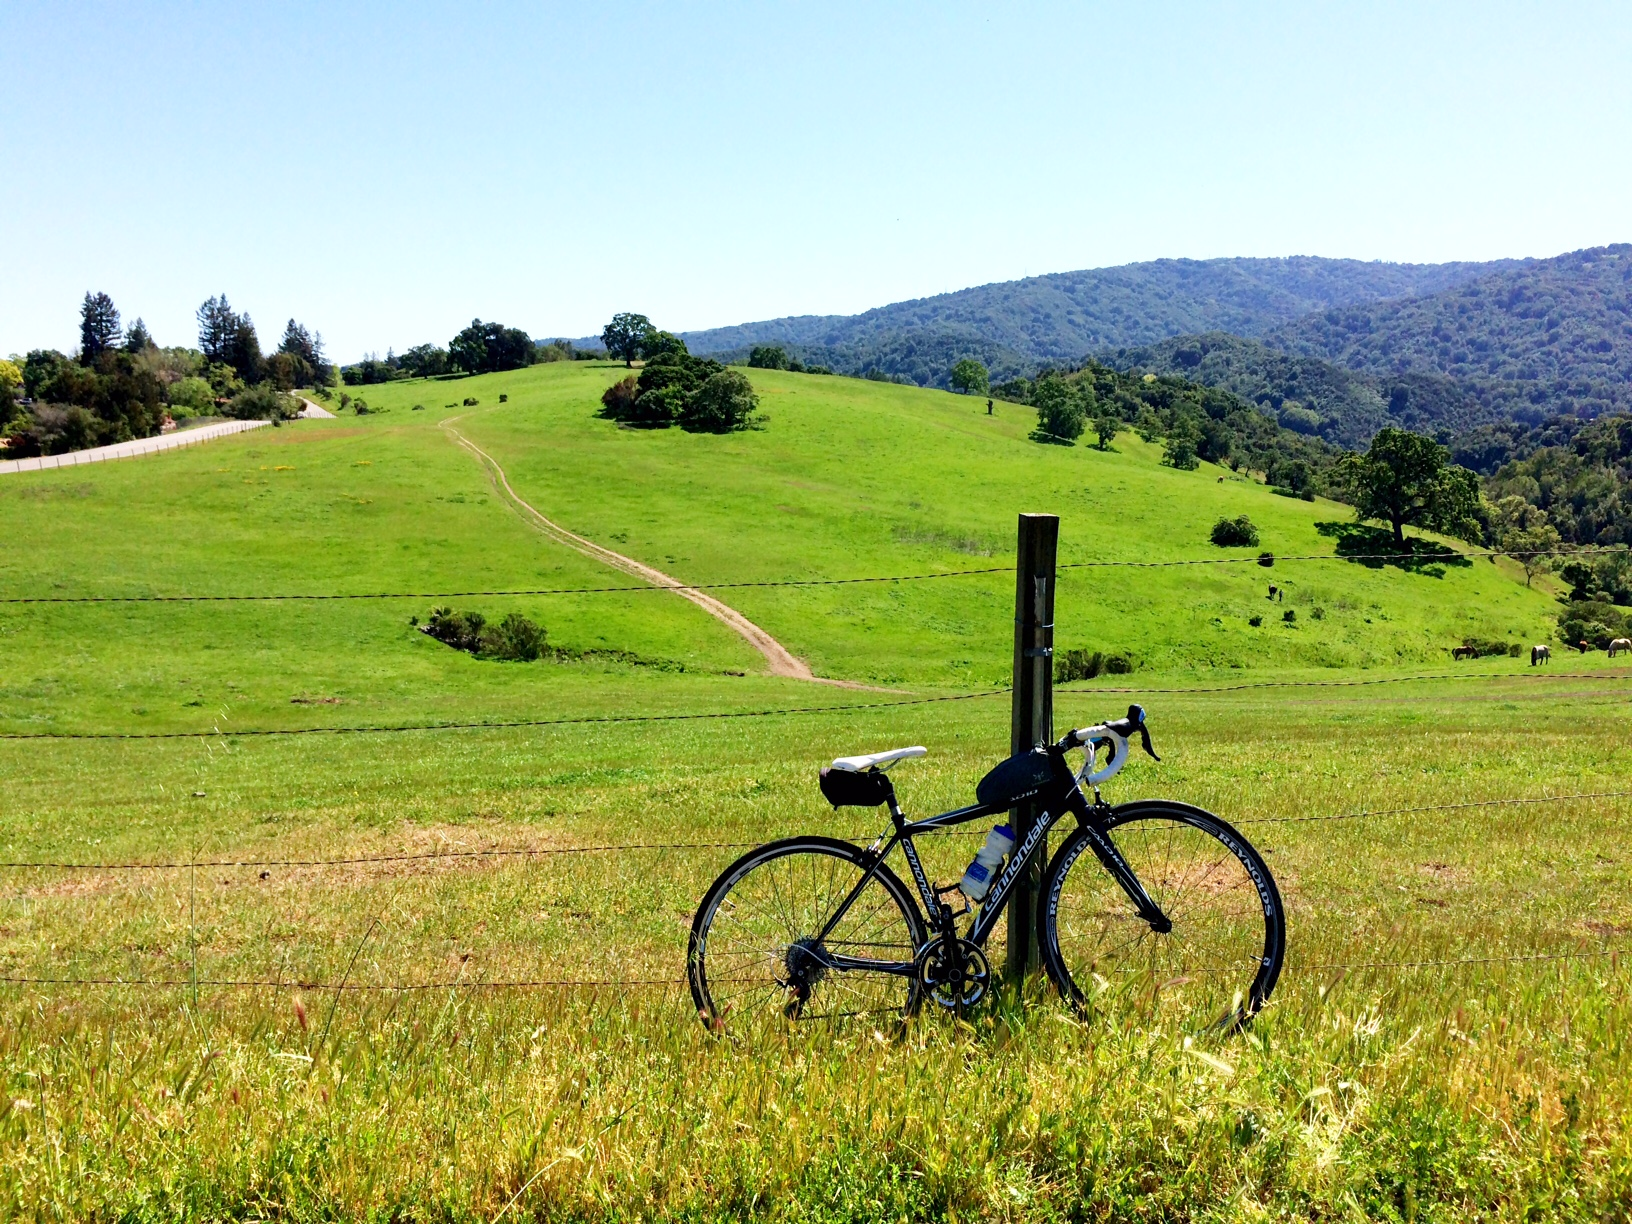 Biking Los Altos Hills